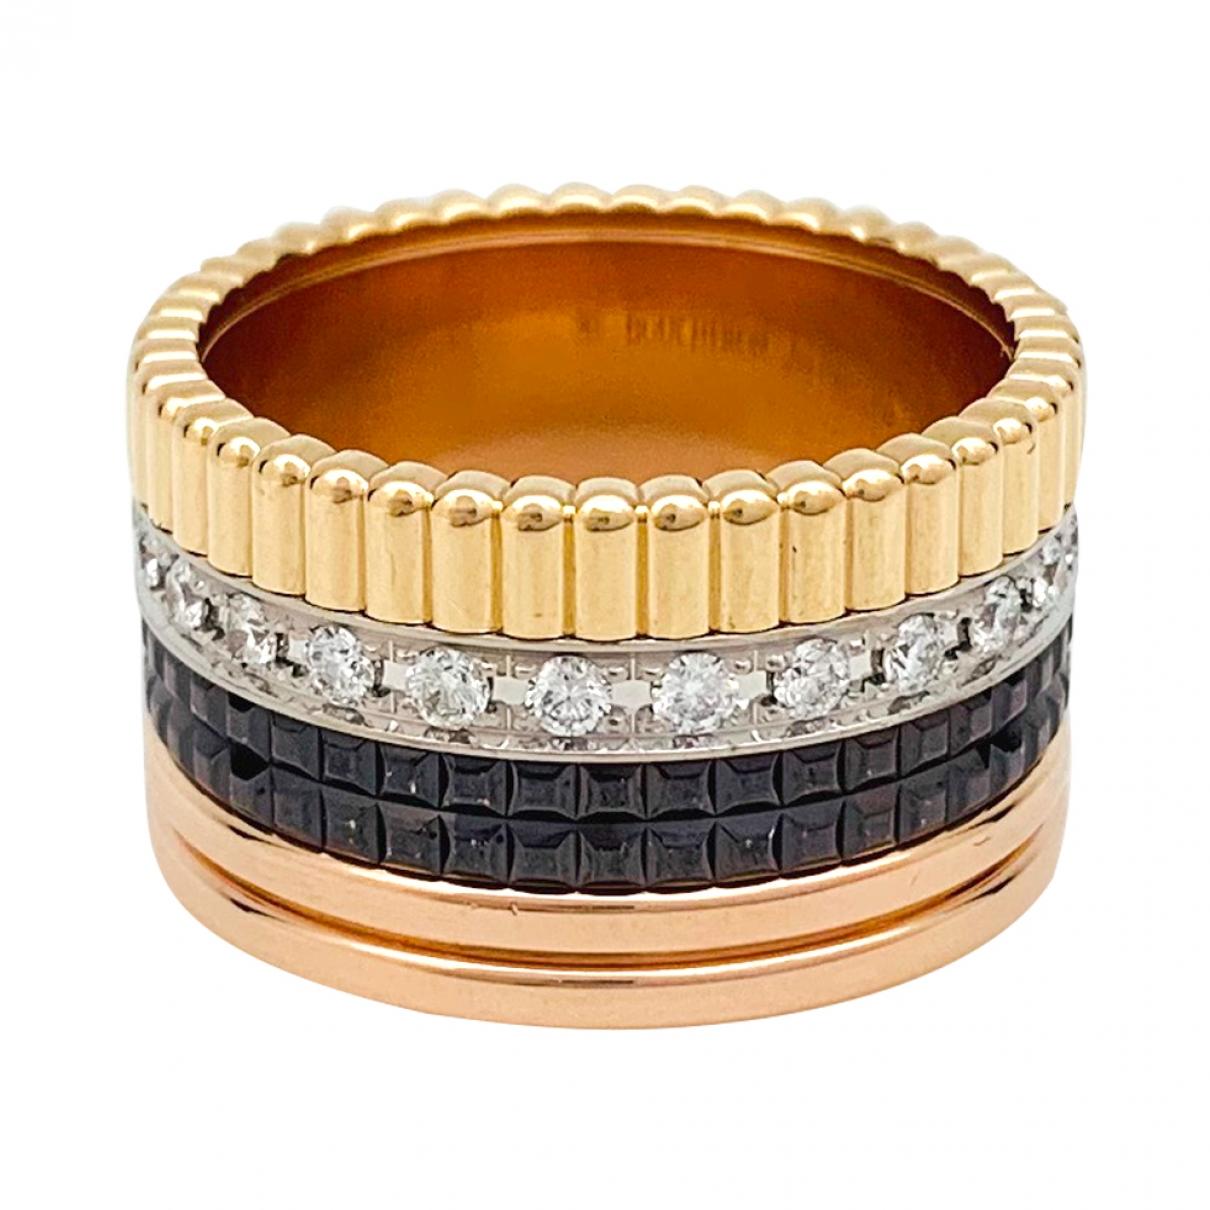 Boucheron Quatre Ring in Rosegold